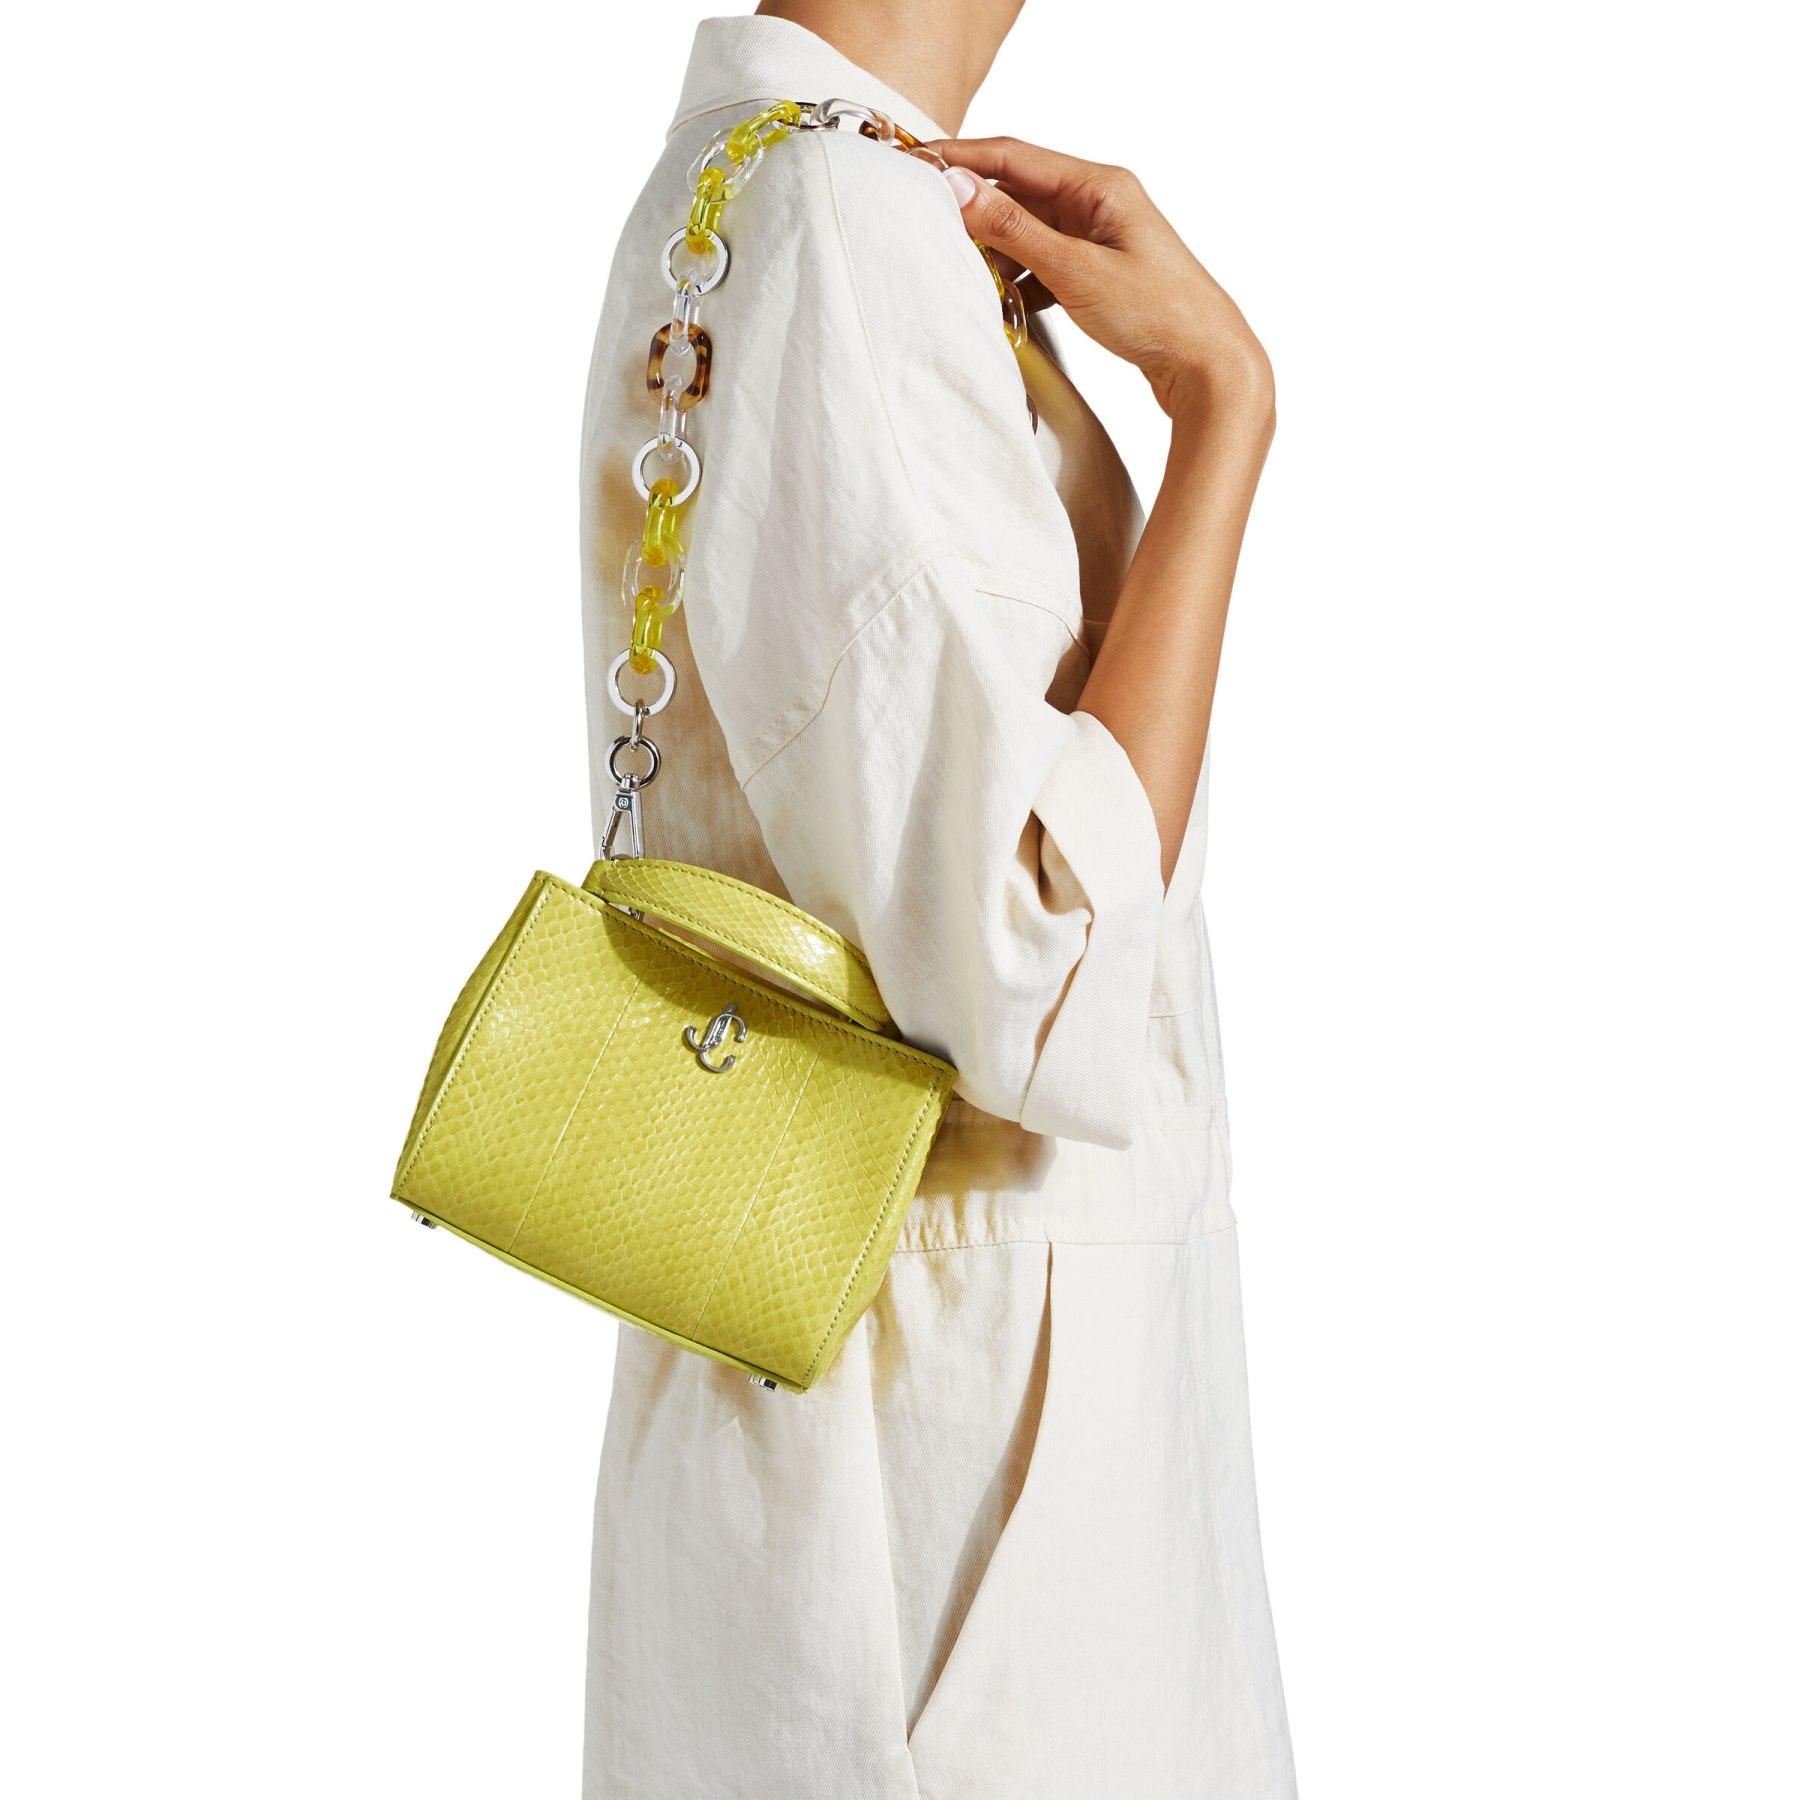 borsa VARENNE Top Handle Mini in elaphe lucido sbiancato dal sole è definita da linee pulite e dettagli moderni.